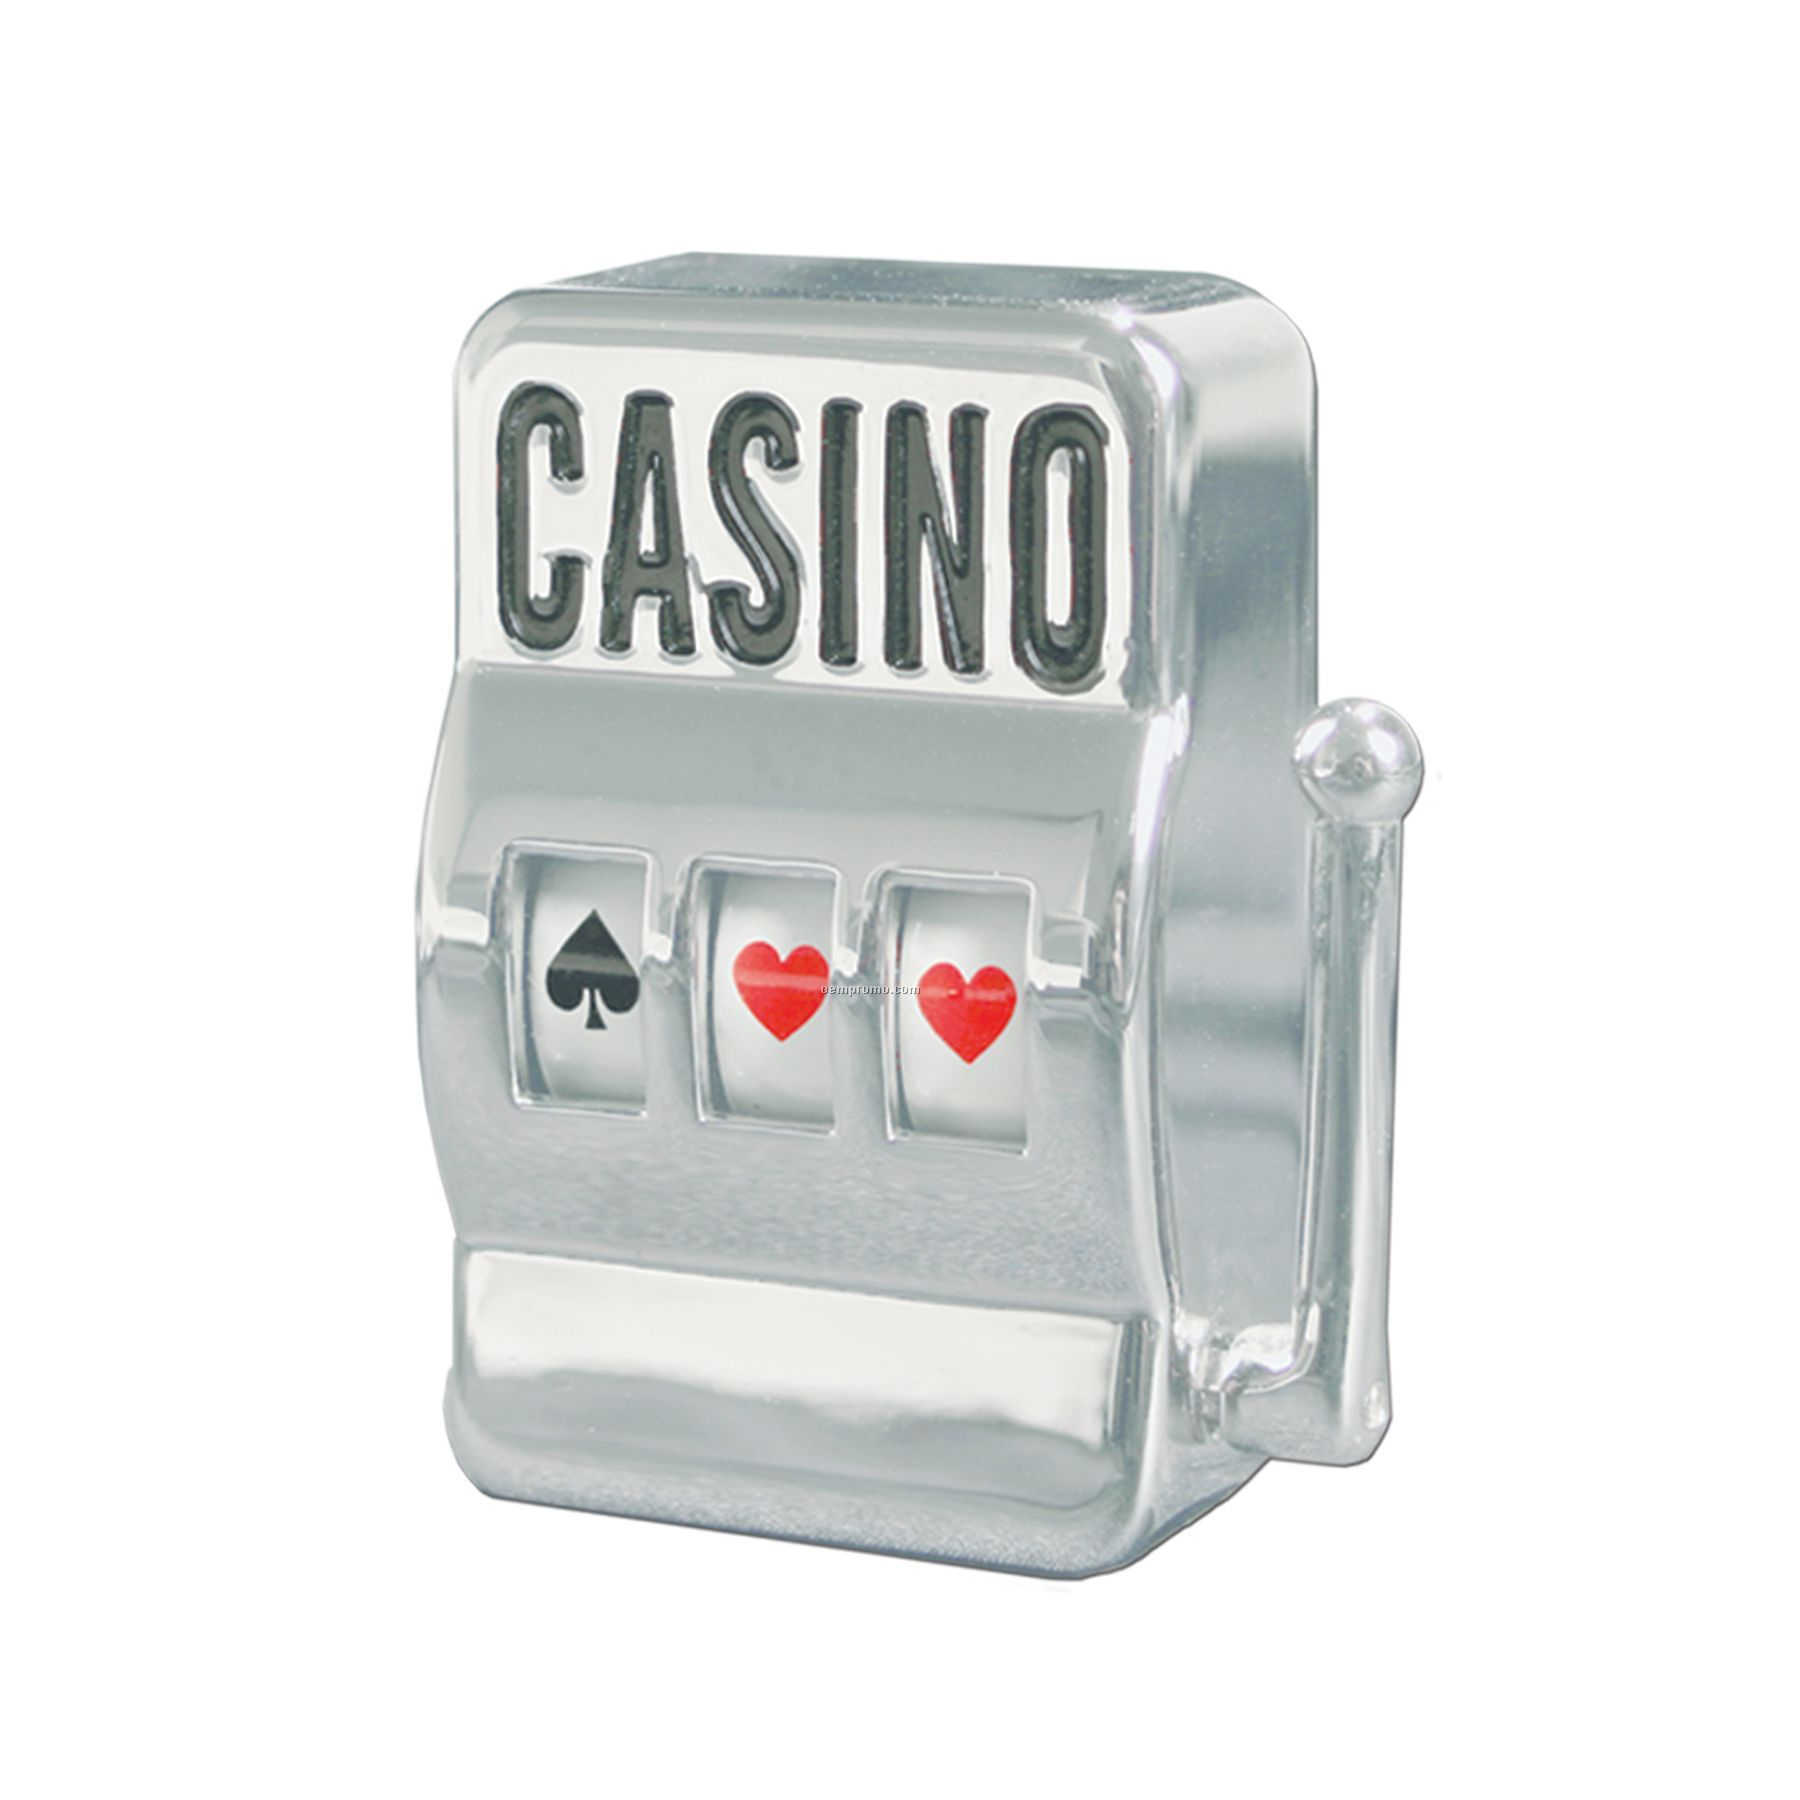 casino online betting slot games kostenlos